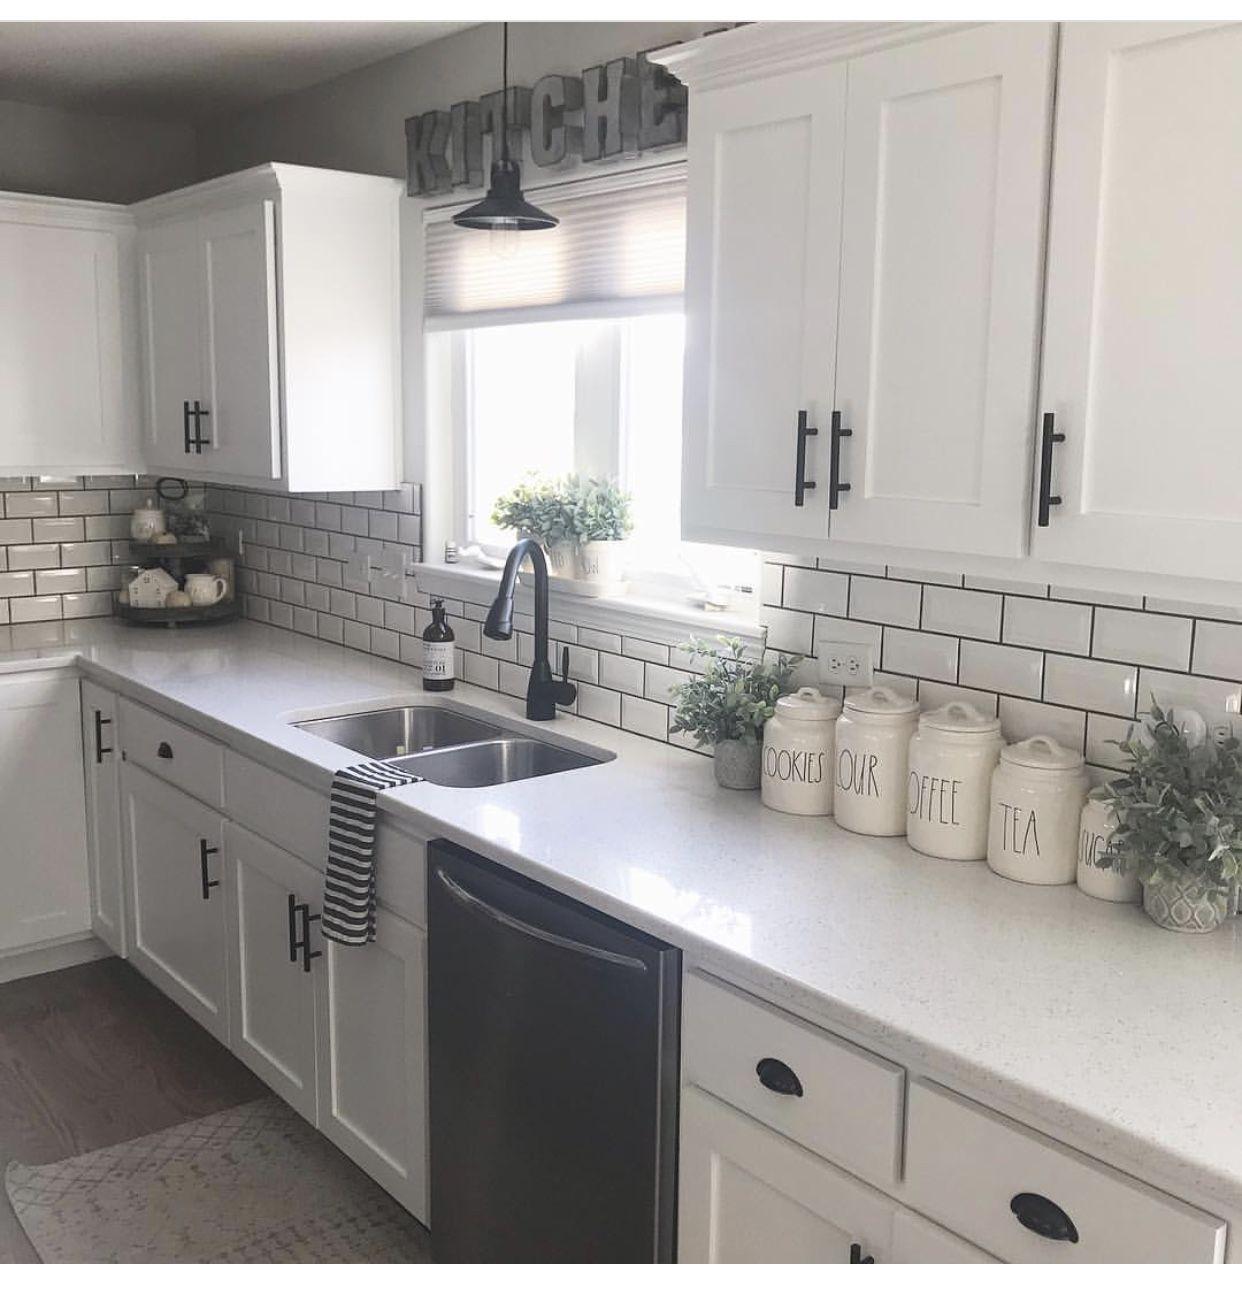 White Kitchen Cabinets With Black Hardware: White Cabinets + Black Hardware.